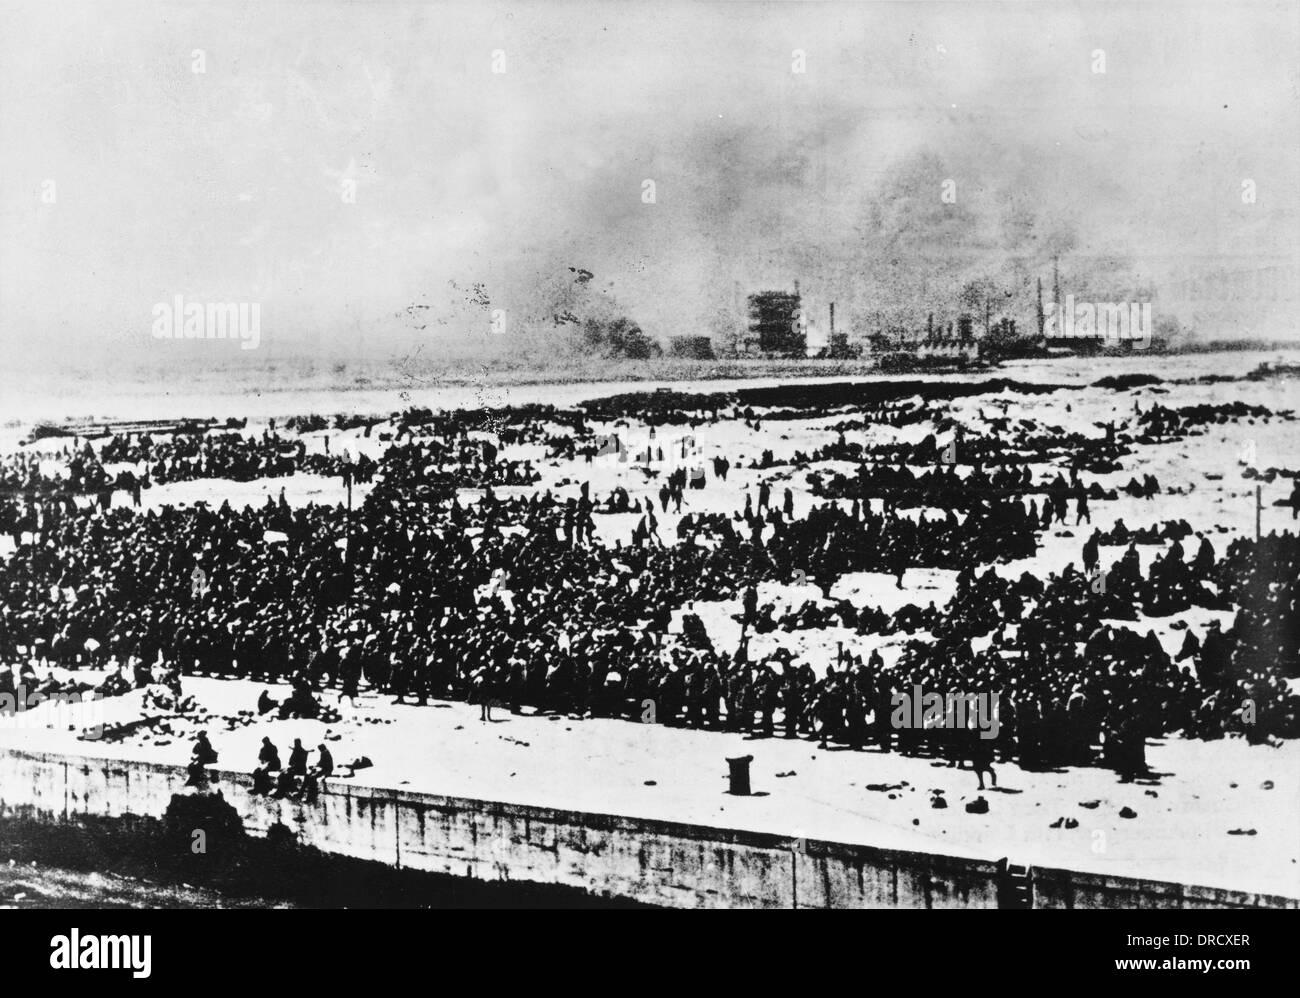 Dunkirk evacuation WWIIStock Photo